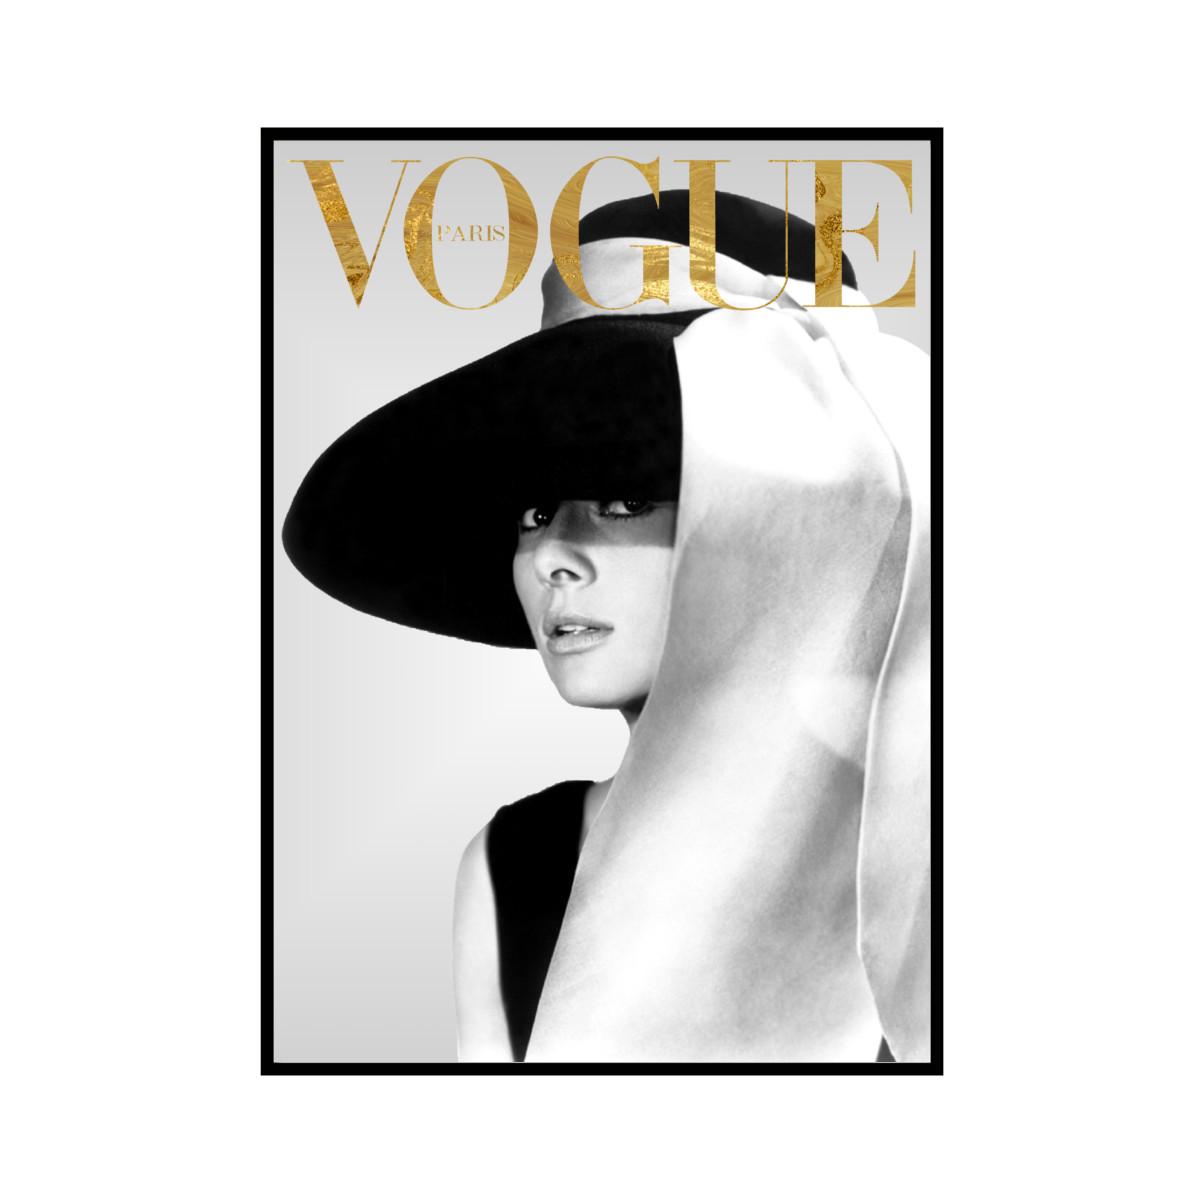 """VOGUE GM"" Audrey Hepburn - VOGUEシリーズ [SD-000578] A4サイズ ポスター単品"